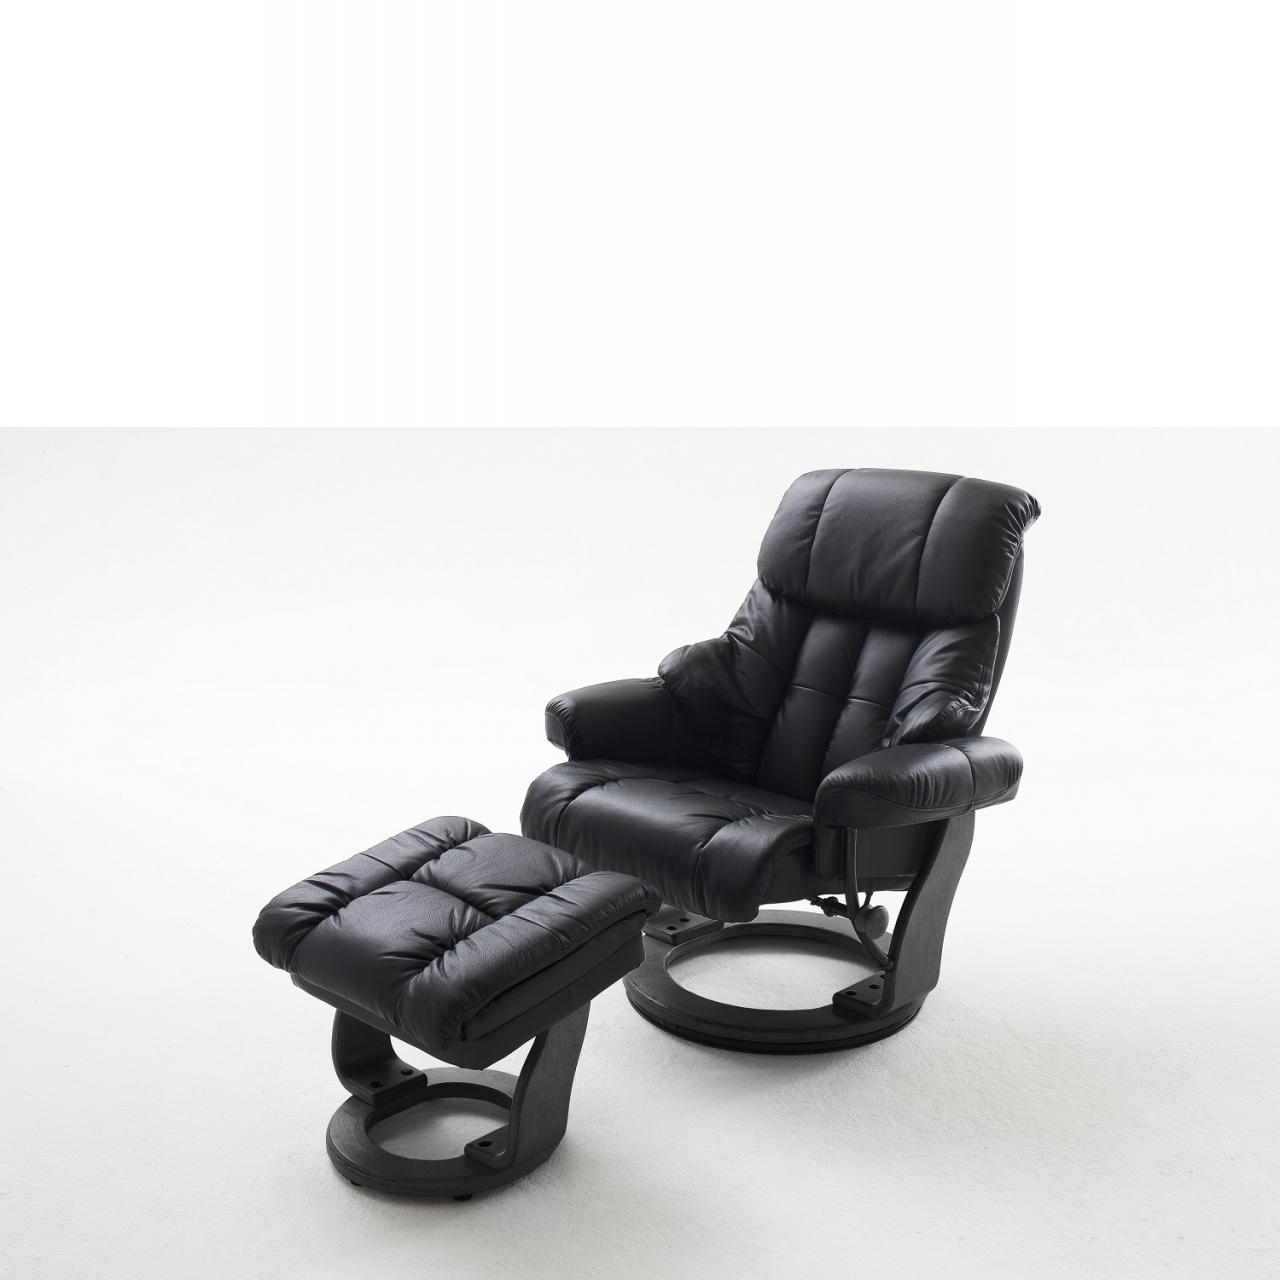 Relaxsessel Calgary schwarz Echtleder 360° drehbar